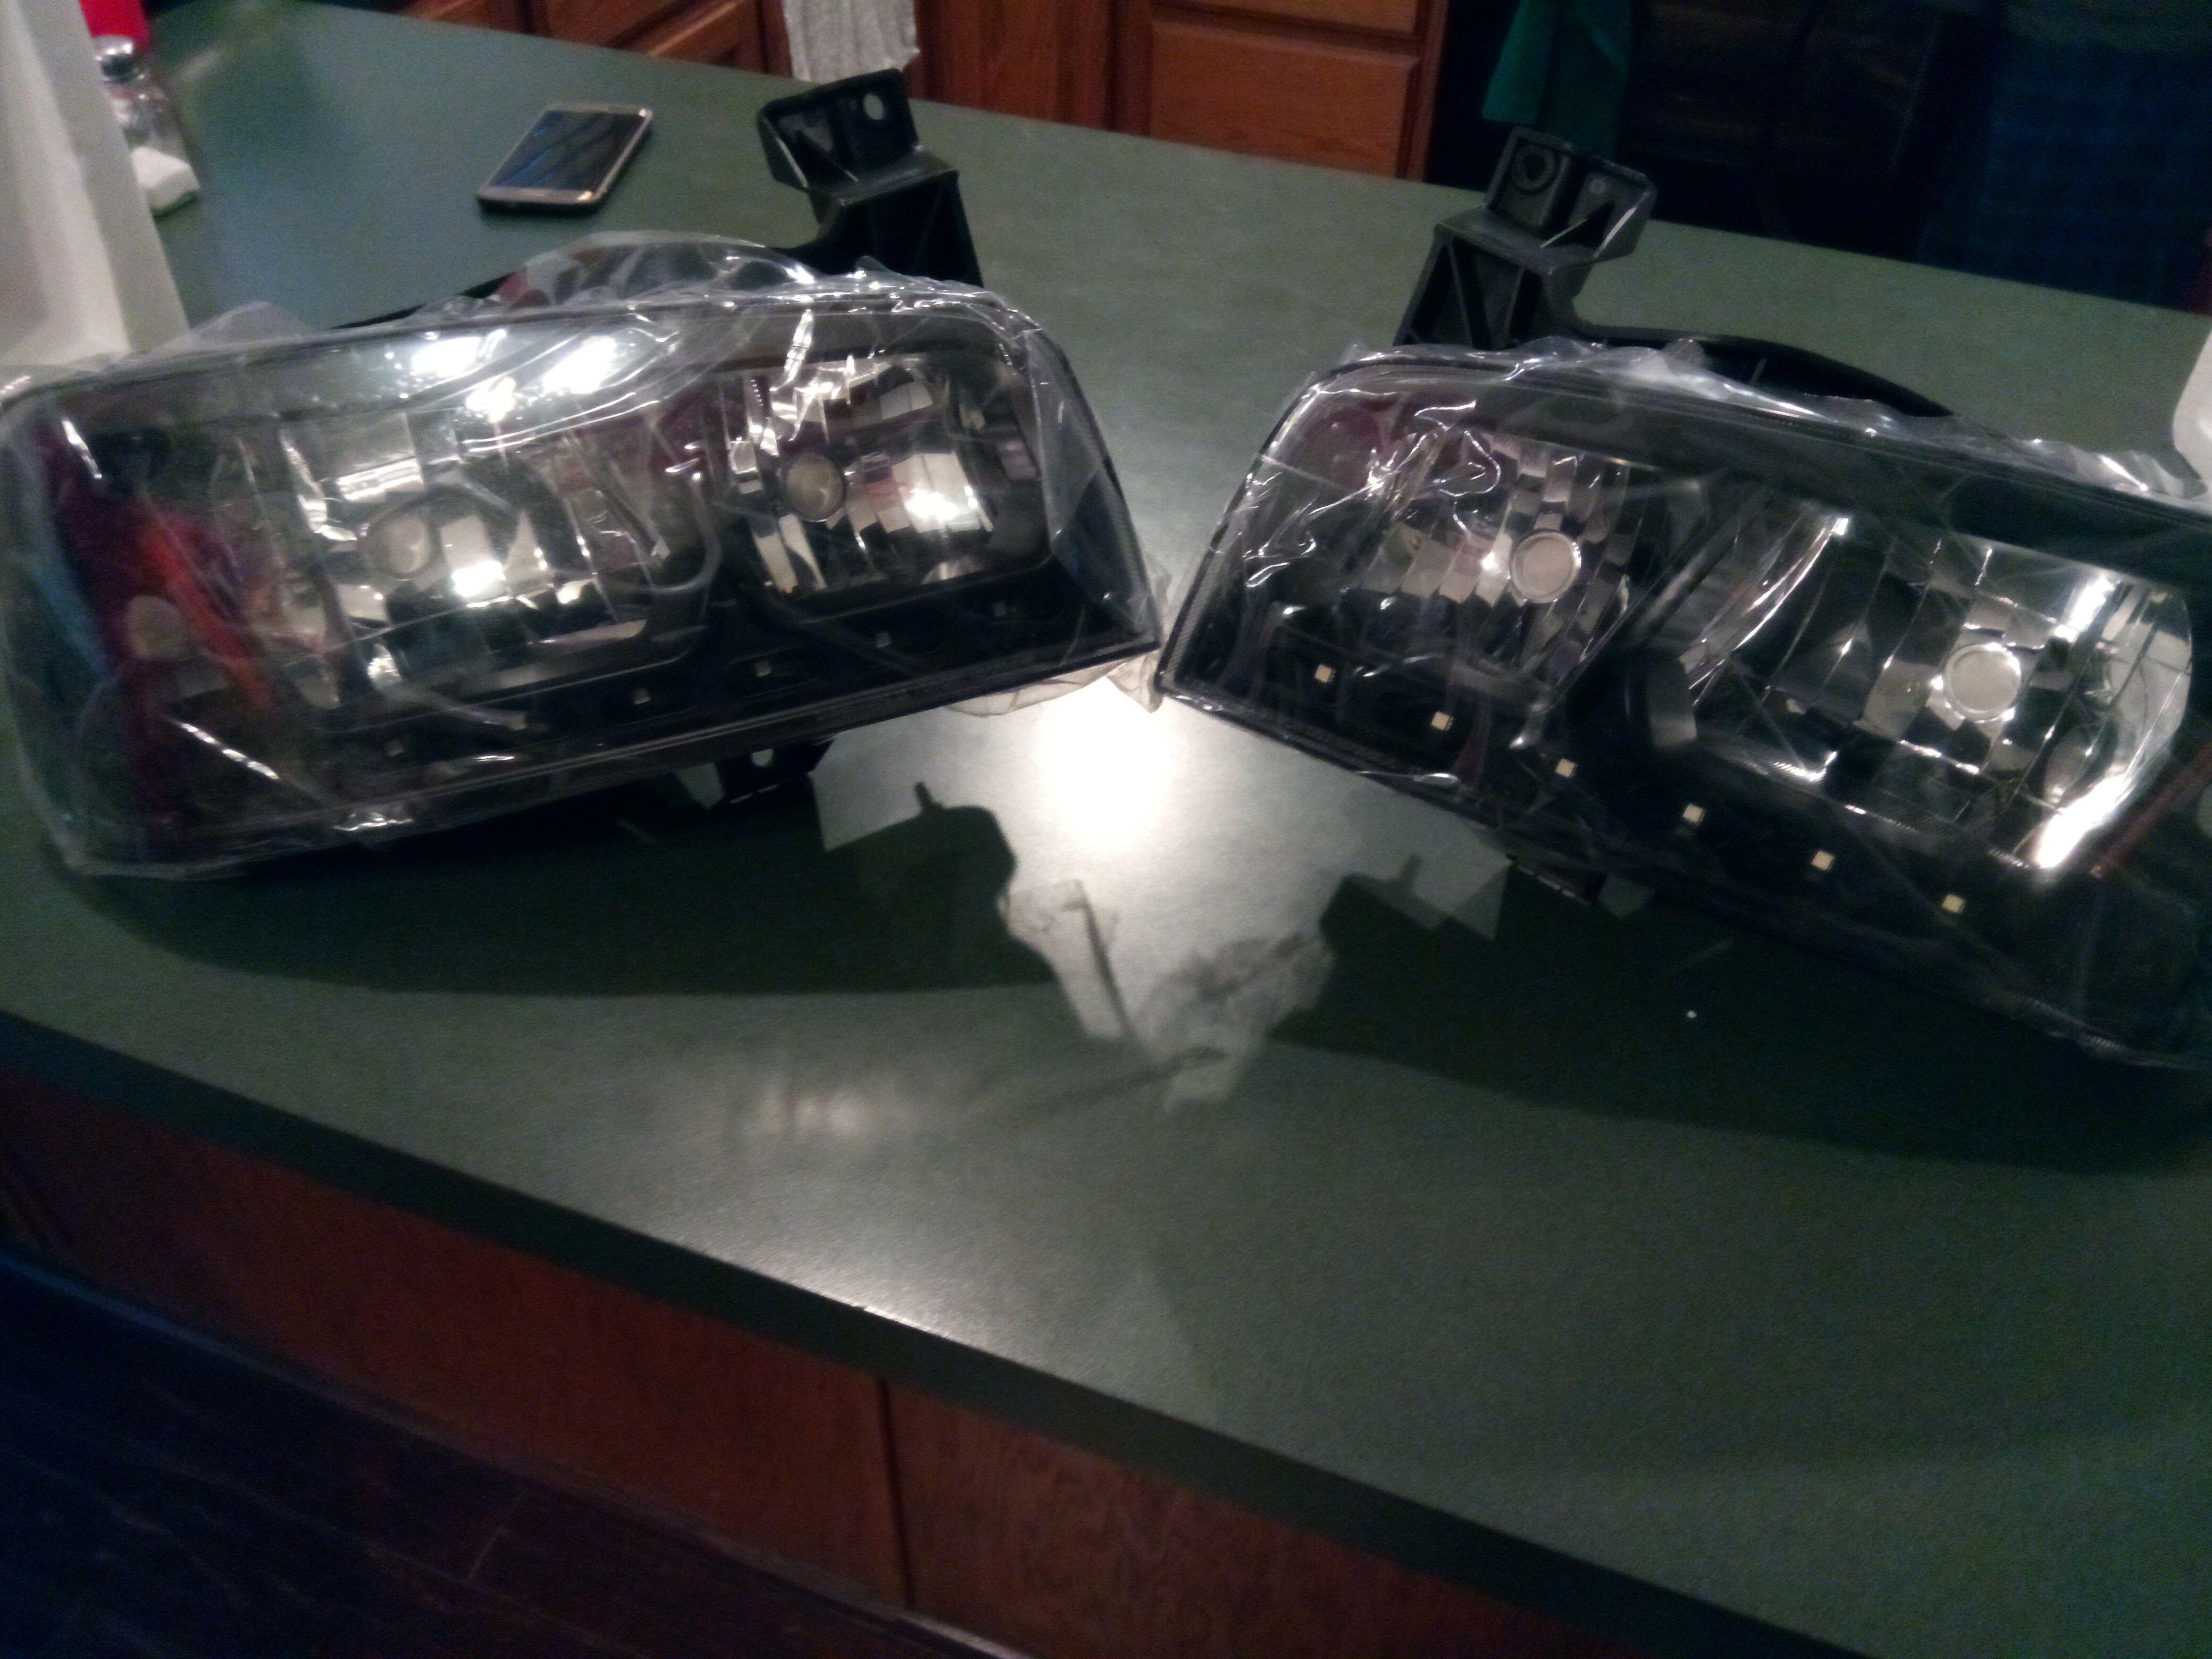 Spec-D charger headlights